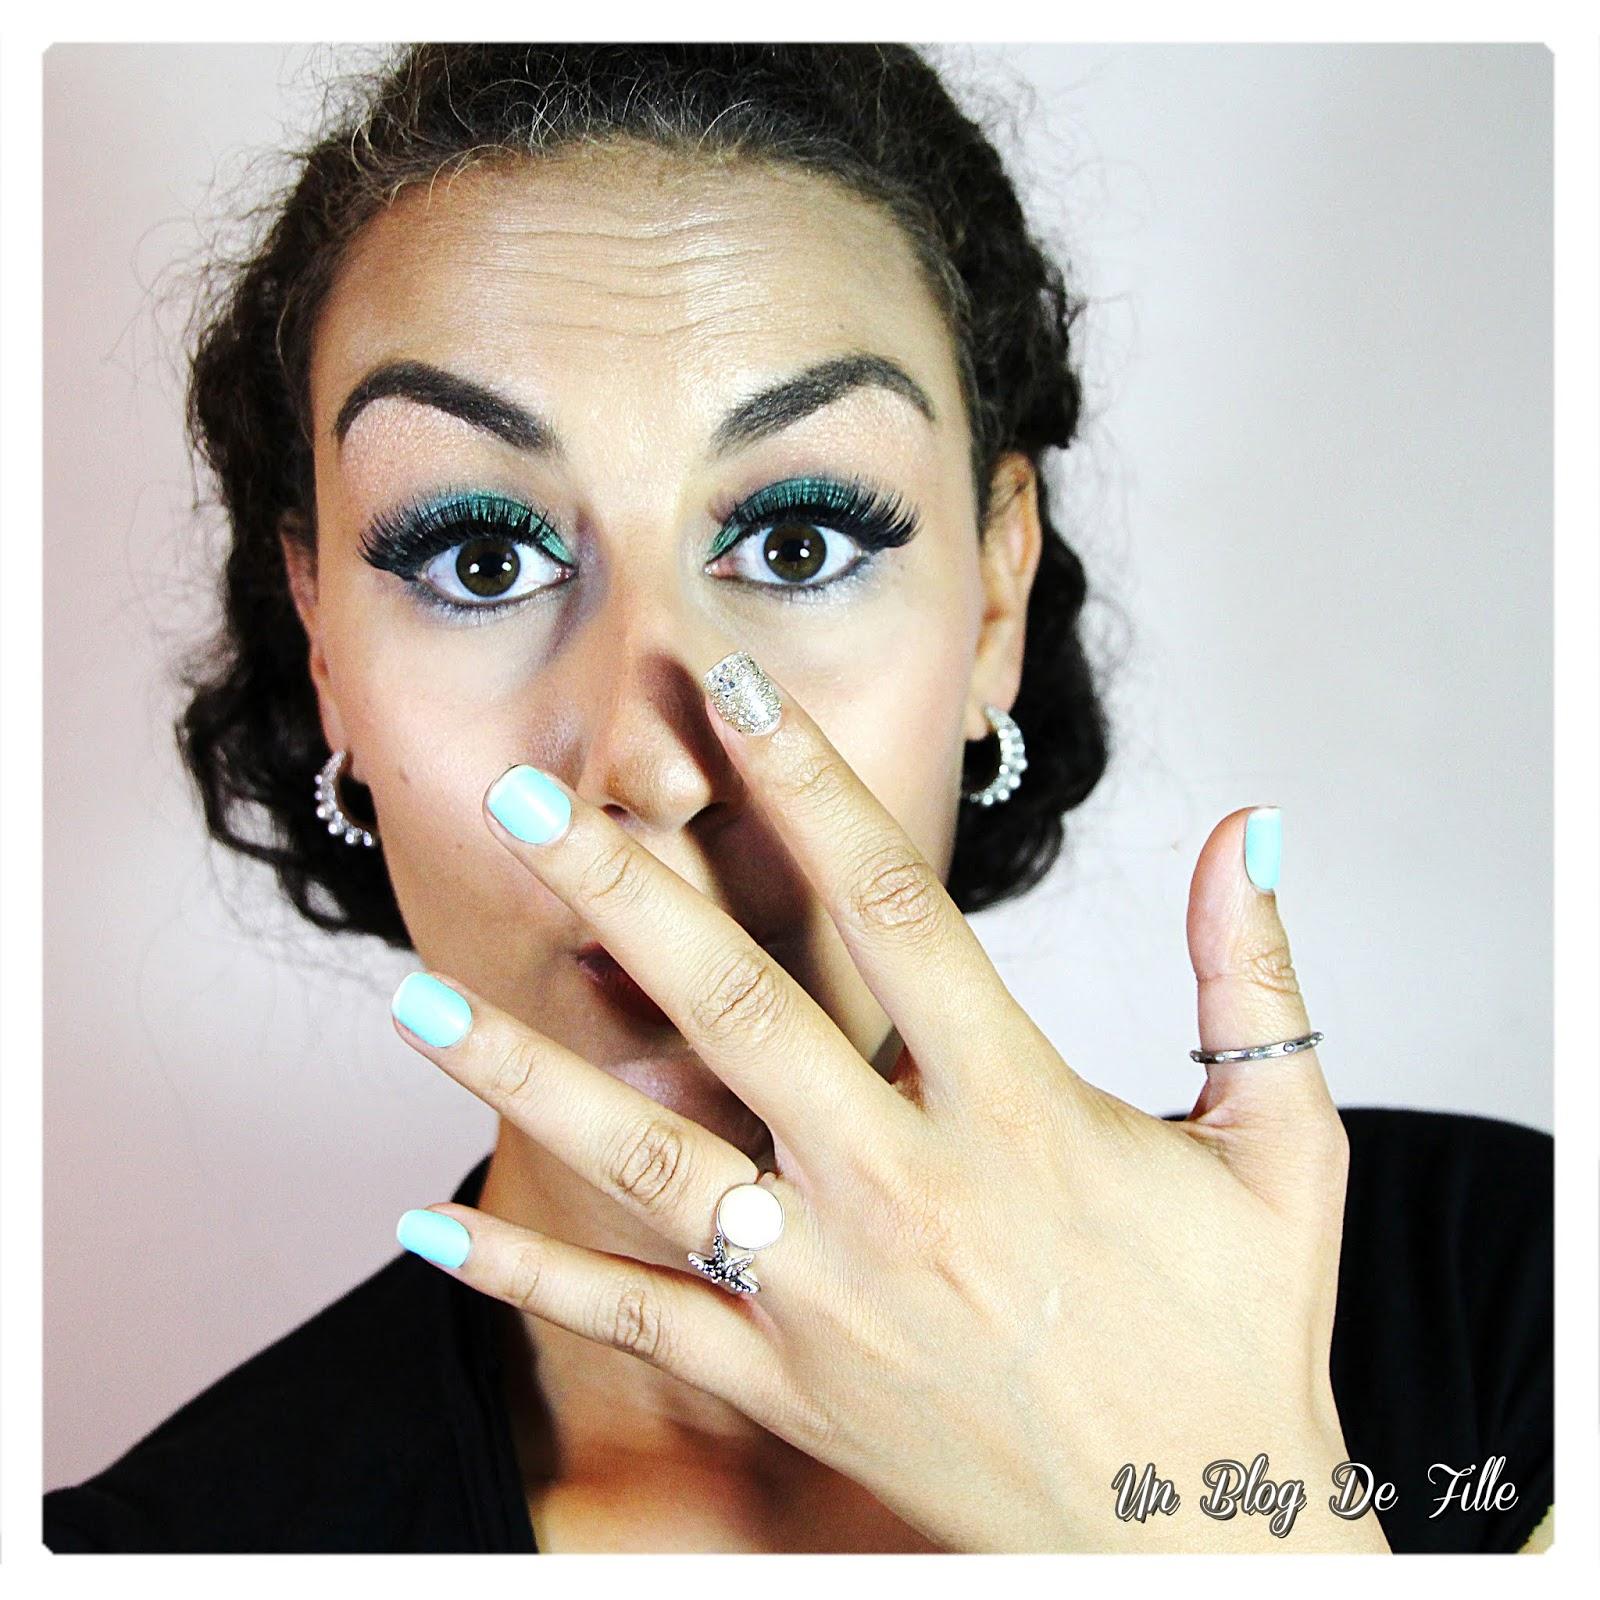 http://www.unblogdefille.fr/2018/07/maquillage-vert-menthe-et-argent-msc.html